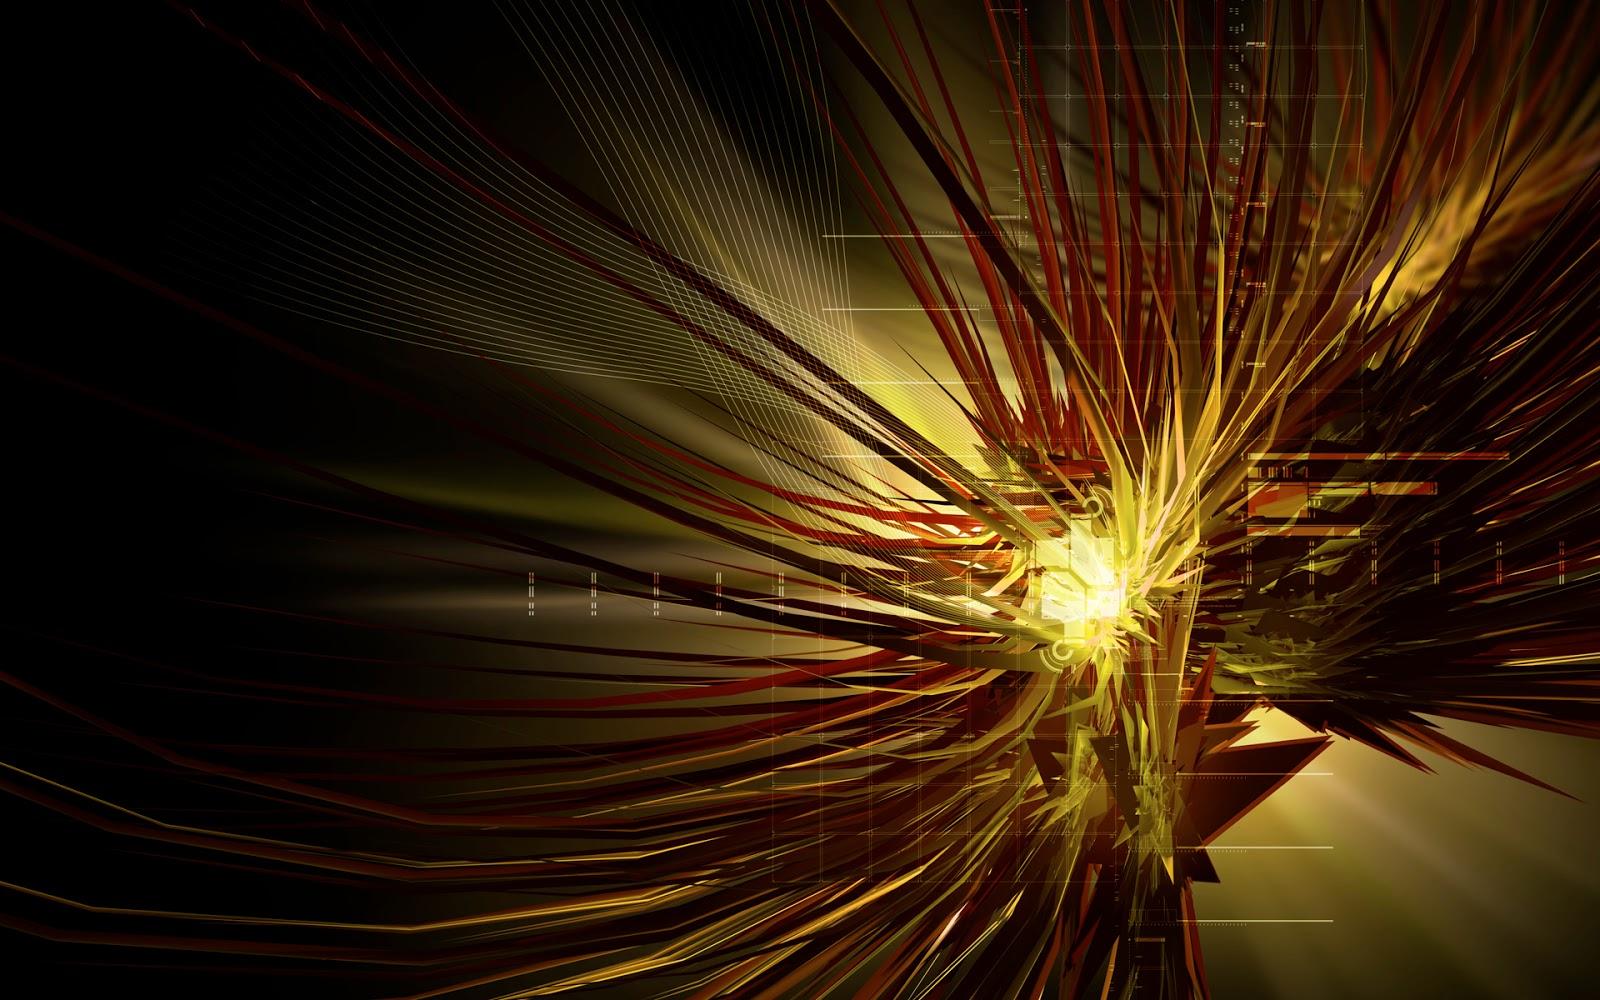 Download abstract art hd desktop wallpaper download abstract art 1600x1000